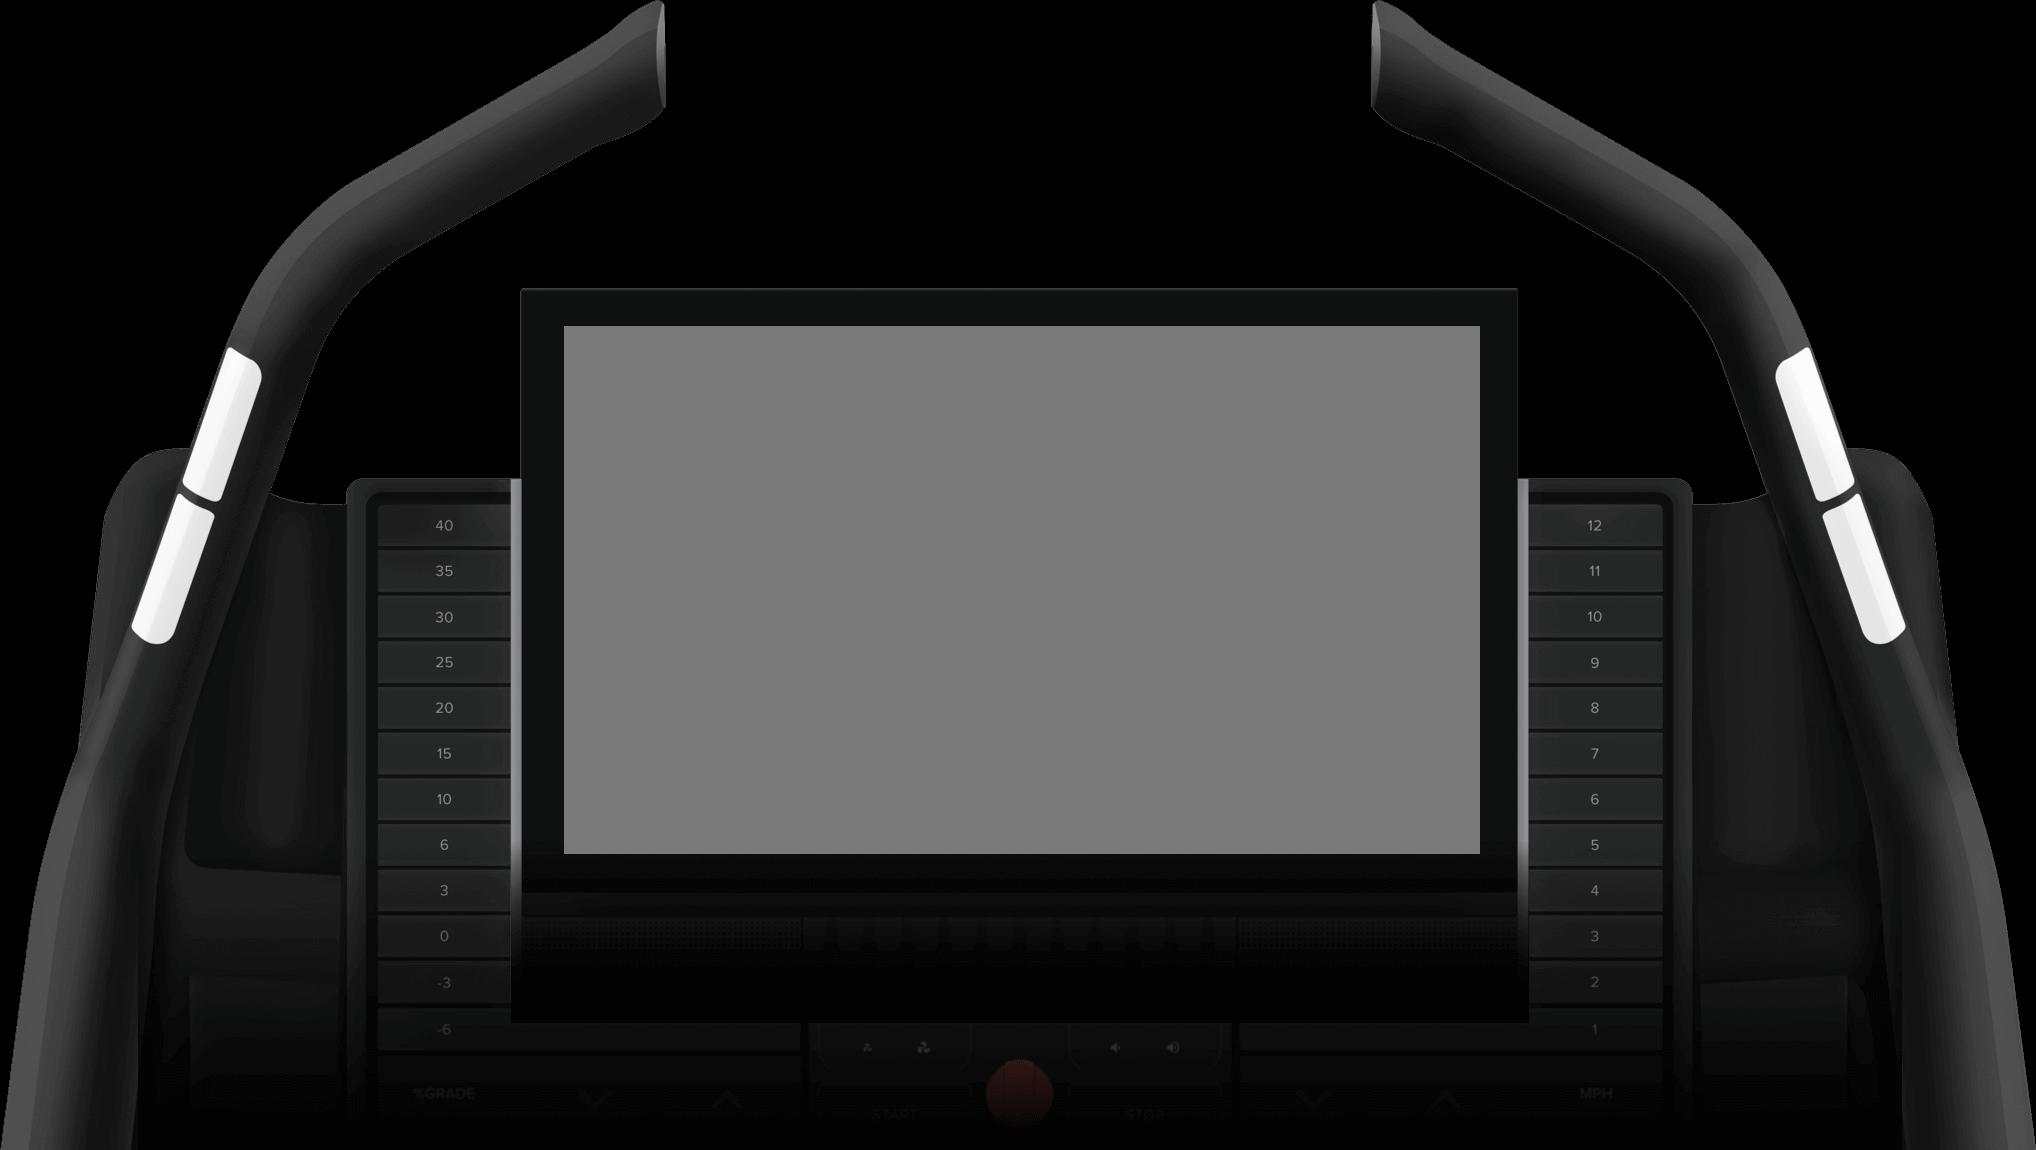 Treadmill screen